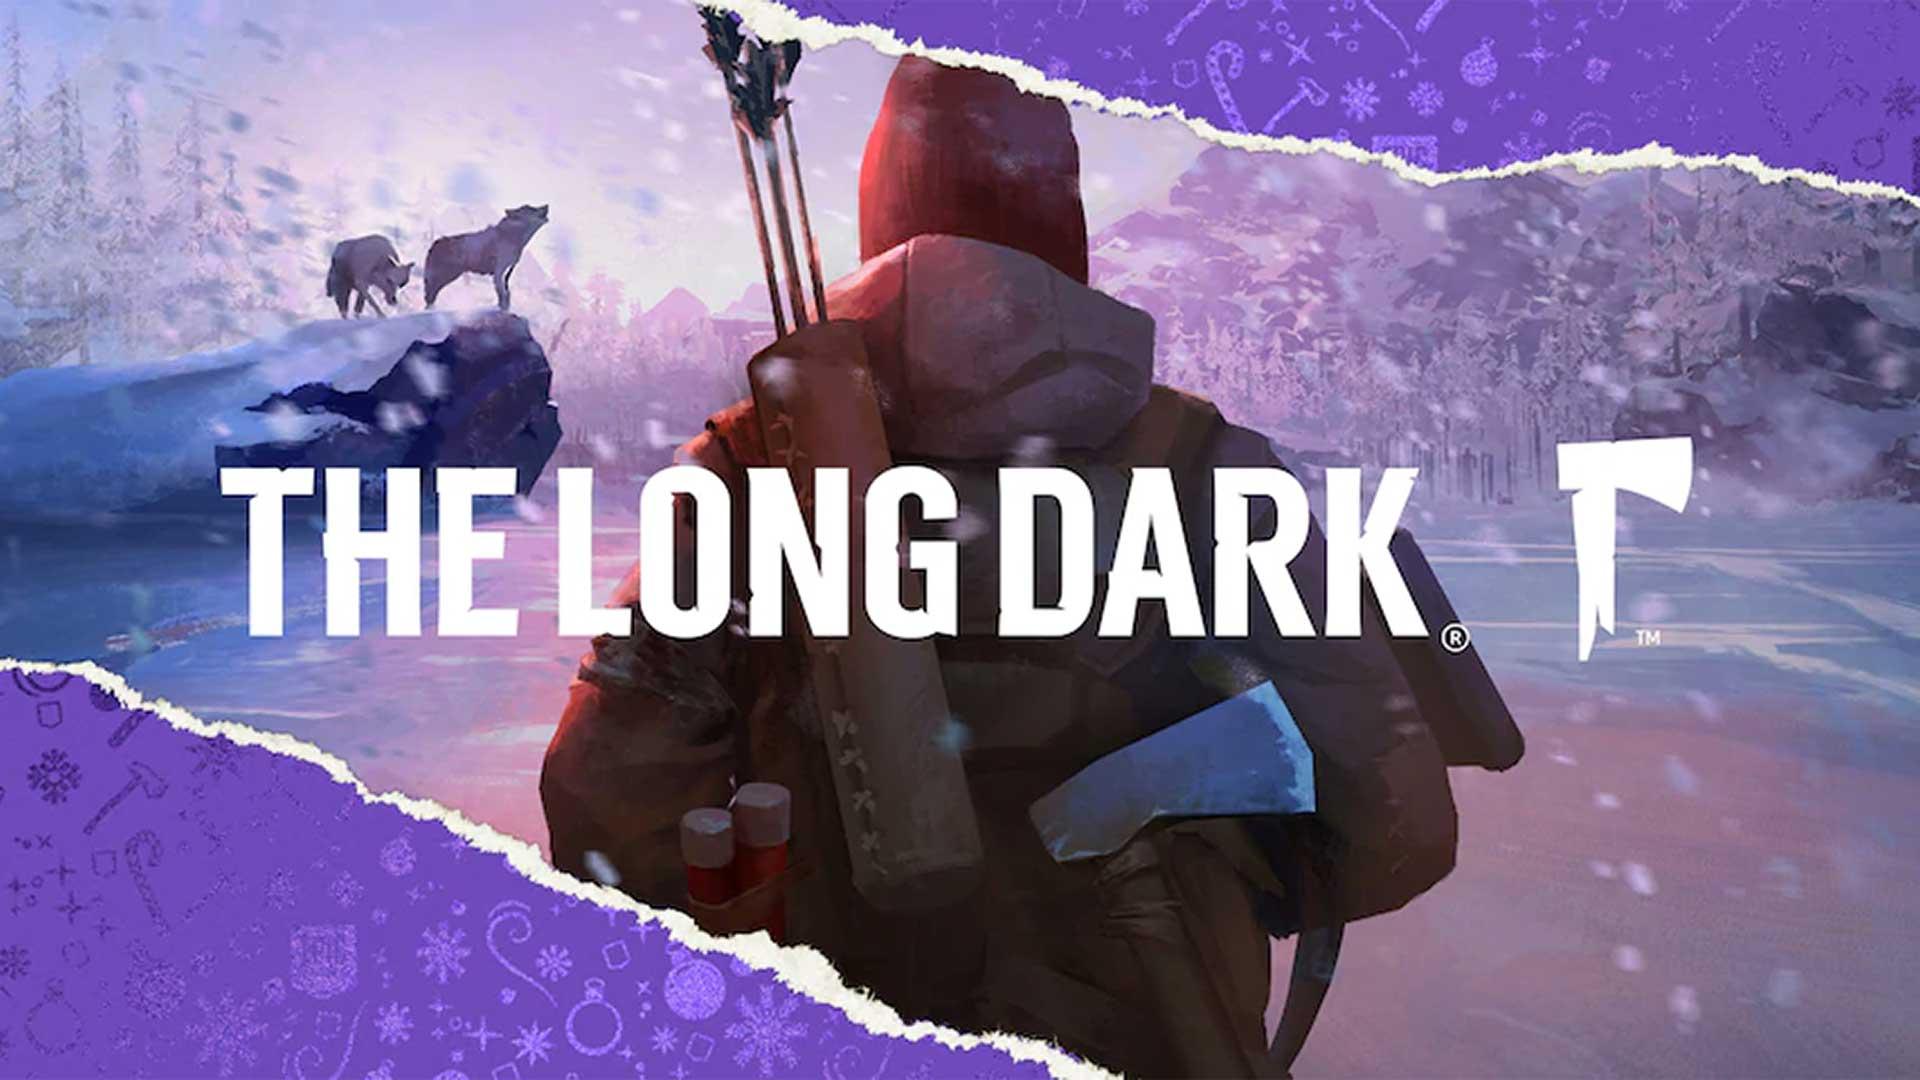 the long dark egs free game